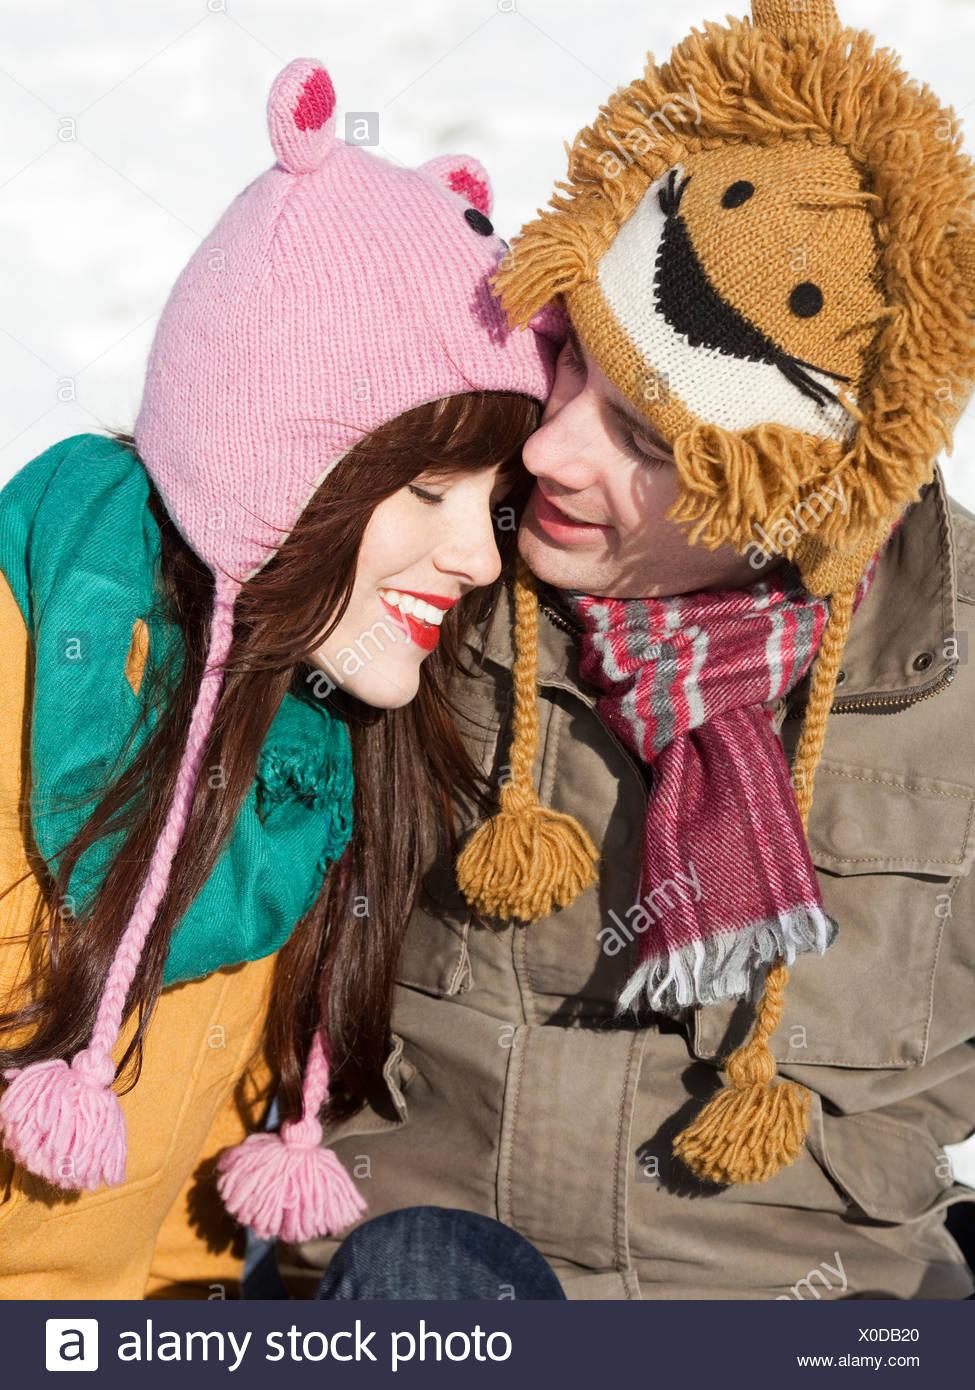 Orem, Utah, USA, boyfriend and girlfriend wearing funny knit hats, embracing - Stock Image